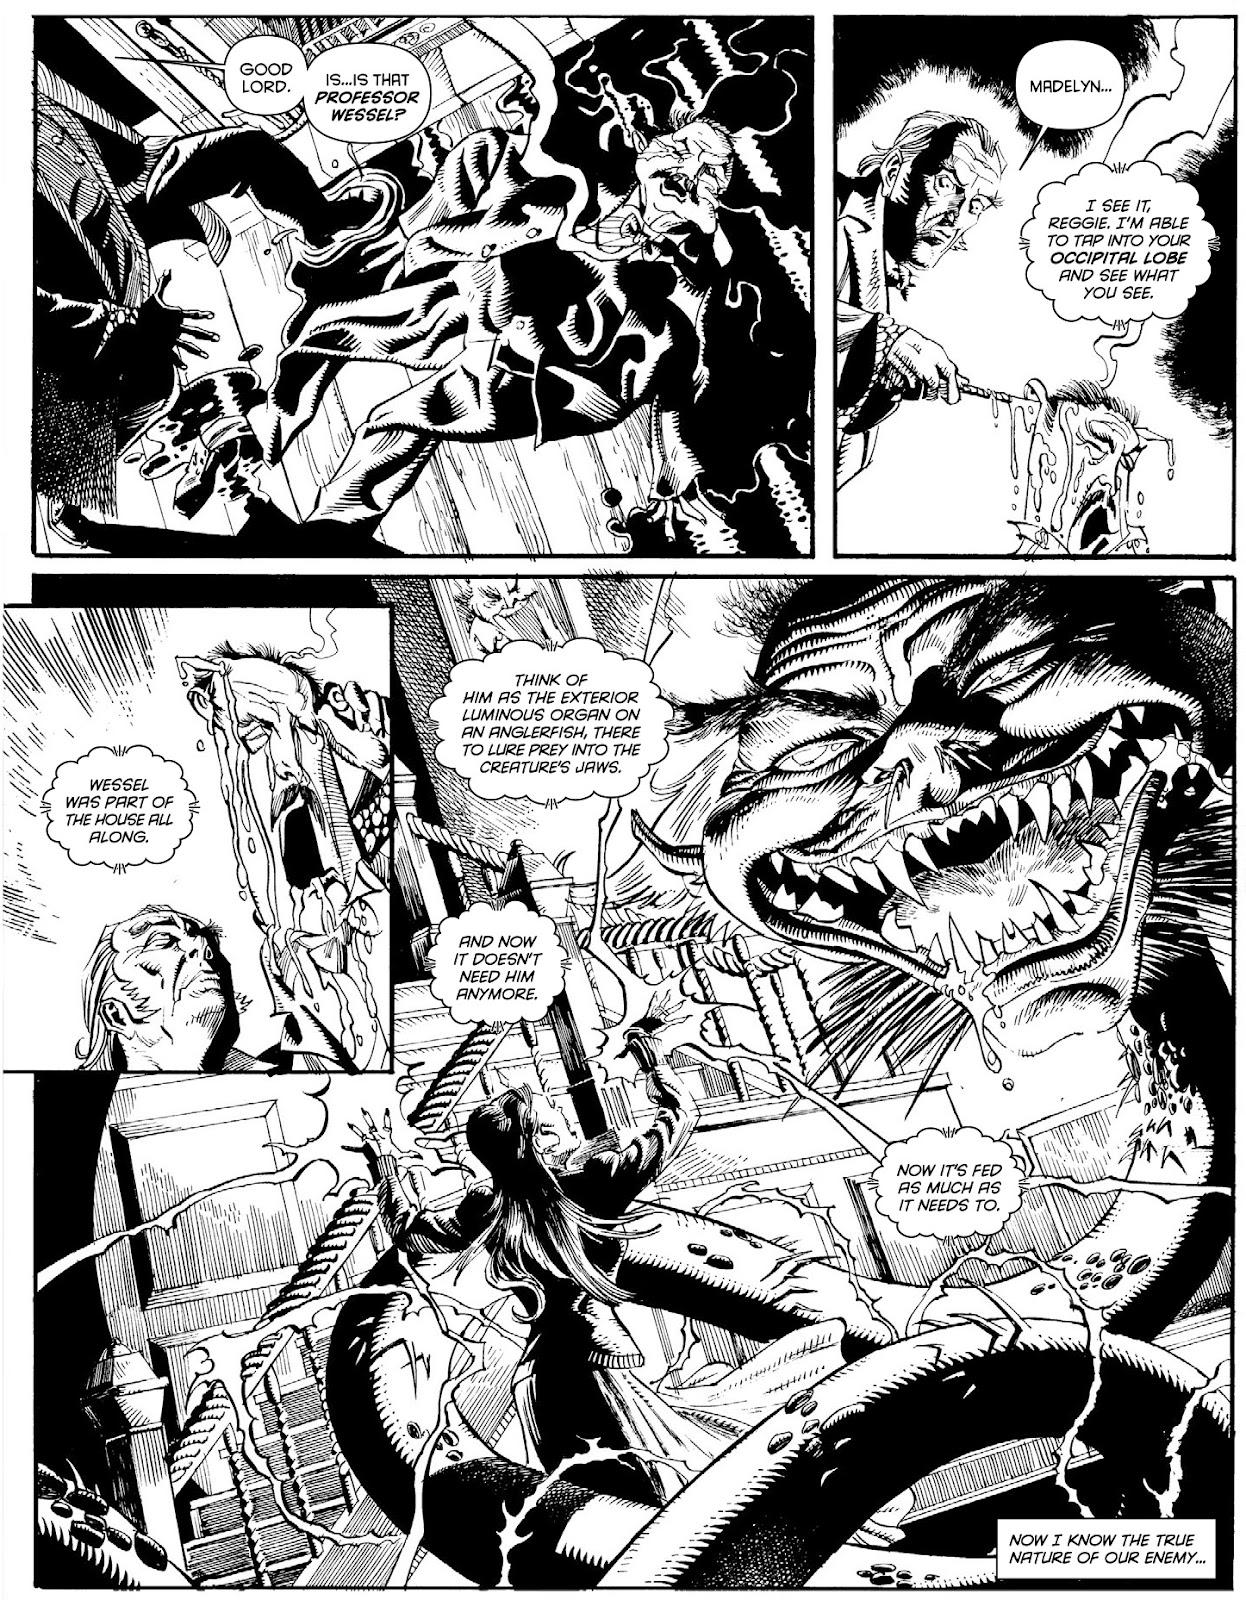 Judge Dredd Megazine (Vol. 5) issue 427 - Page 102